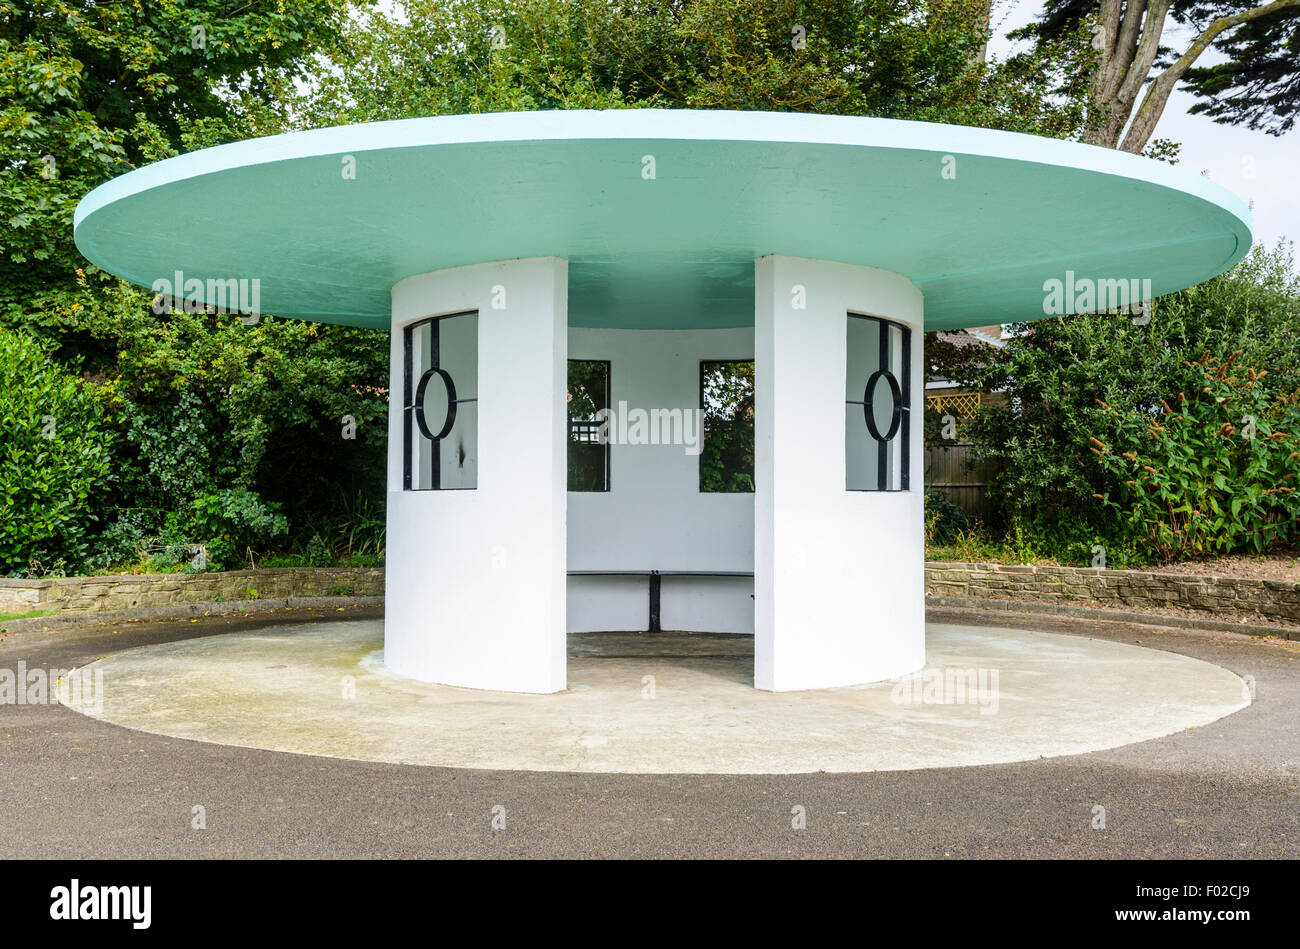 Circular Art Deco Shelter built in the 1930's in Mewsbrook Park, Littlehampton, West Sussex, England, UK. - Stock Image